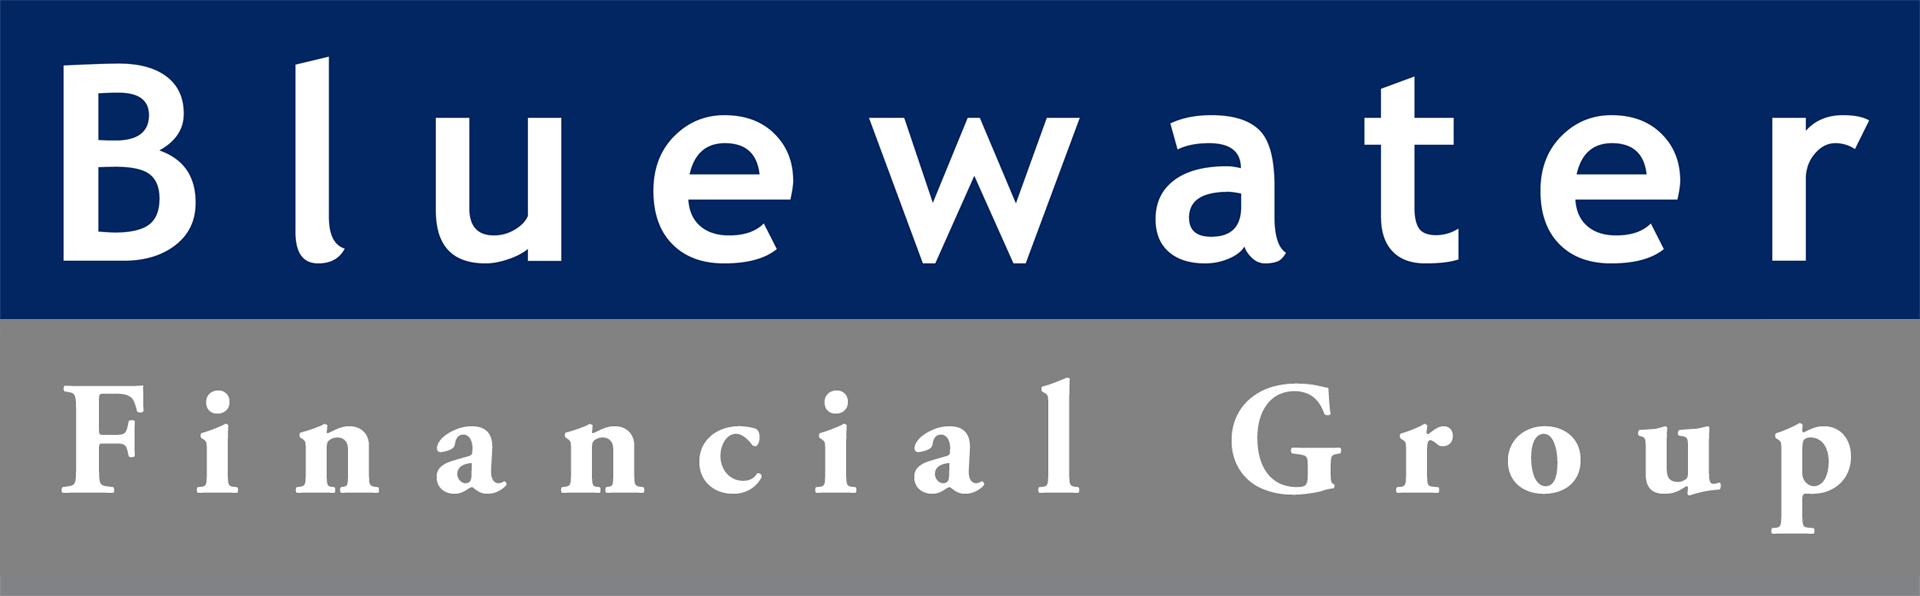 https://www.bluewaterfg.com.au/wp-content/uploads/2019/09/logo.jpg